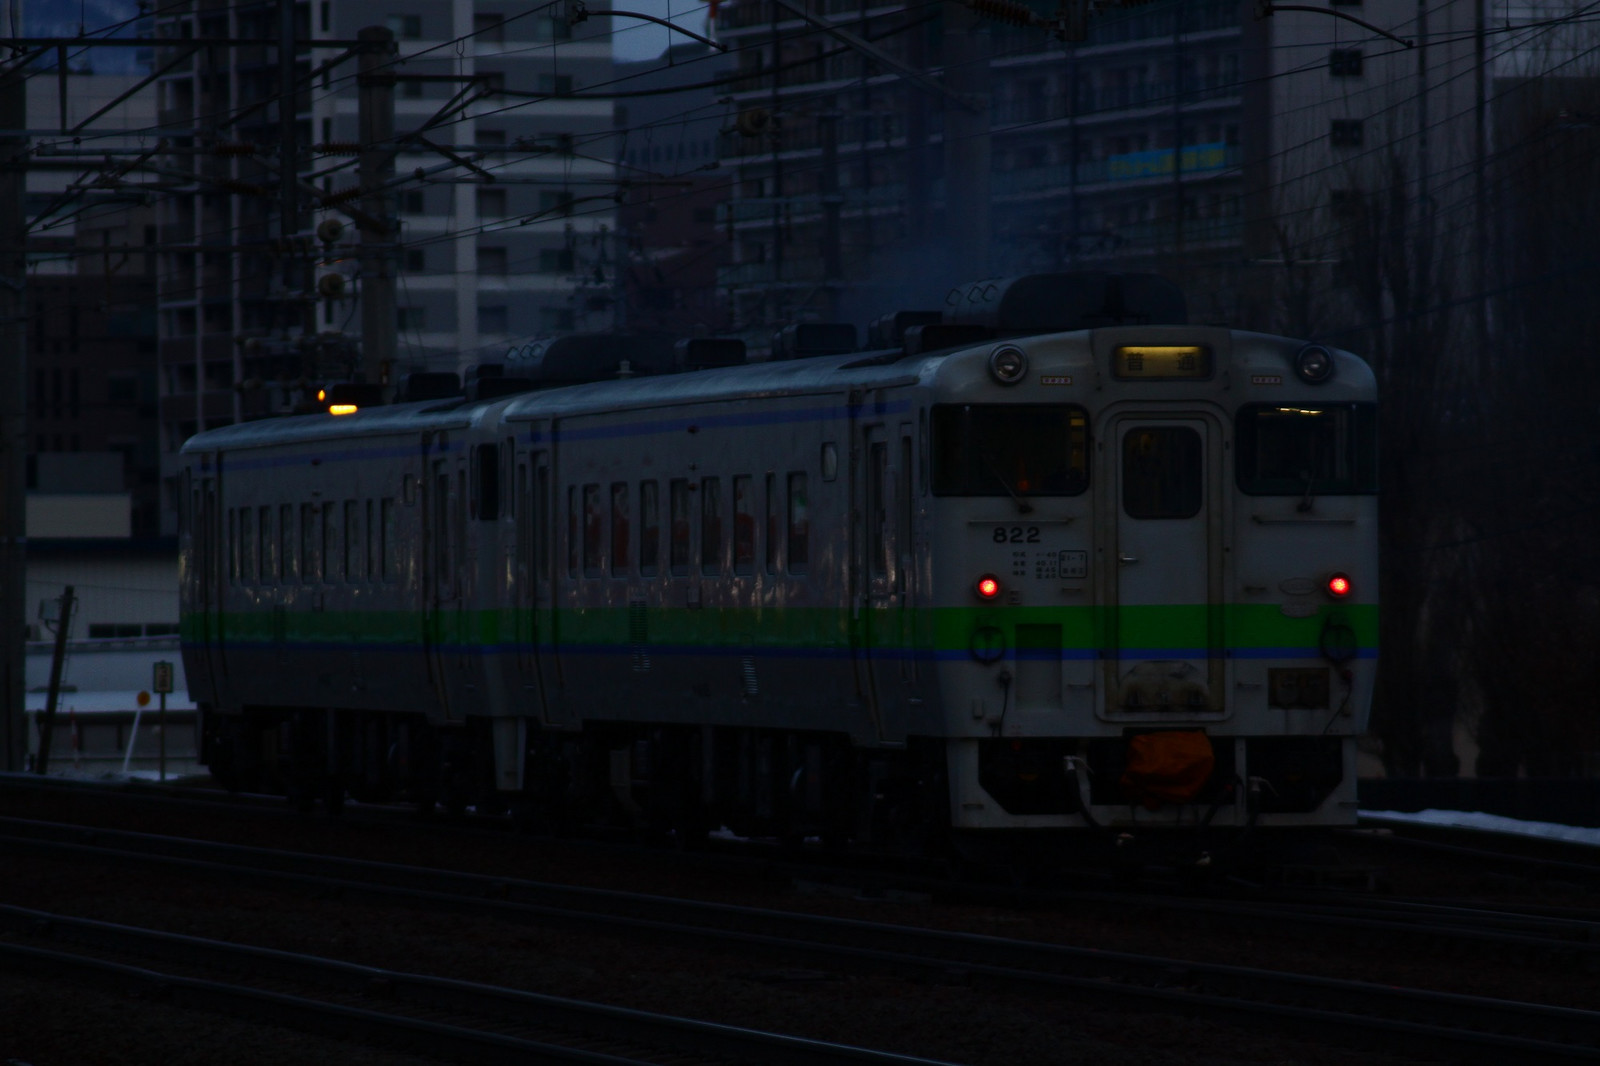 Jr1703193001